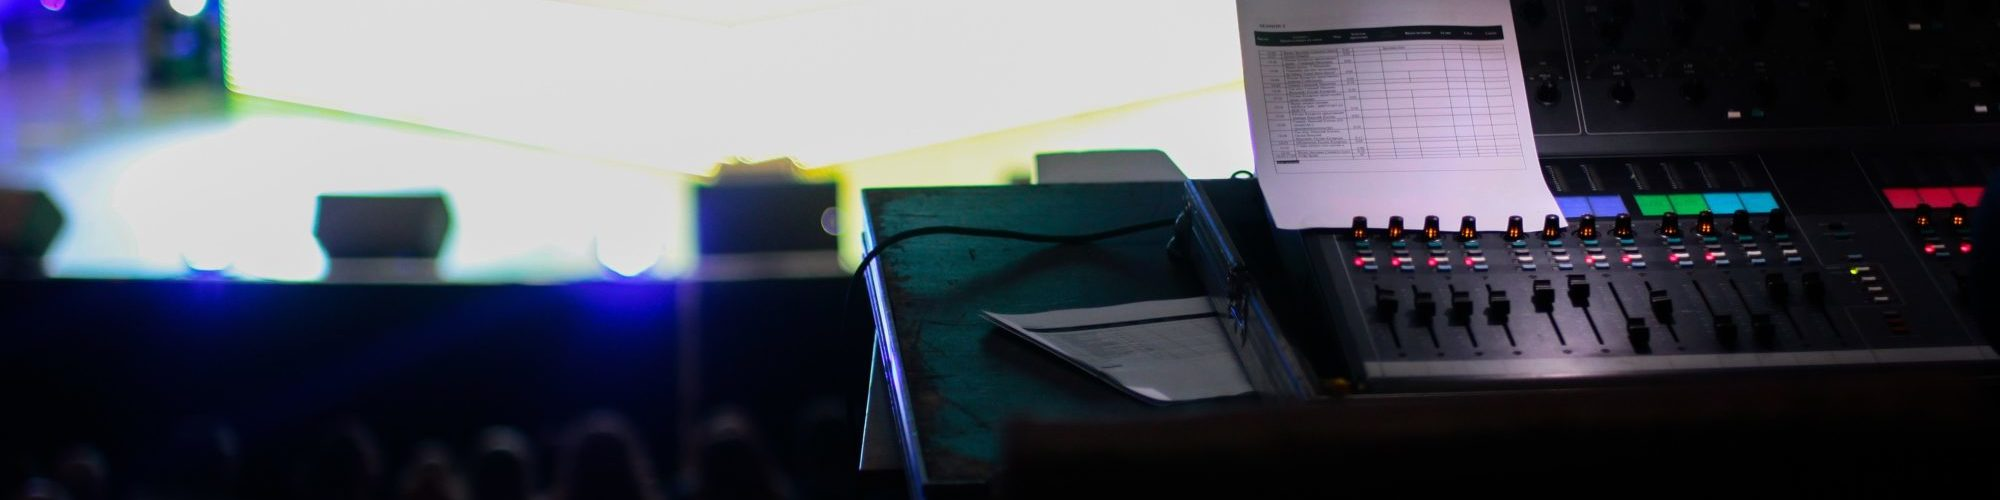 table de mixage au chateau troissy internat college lycee cinema 7e art